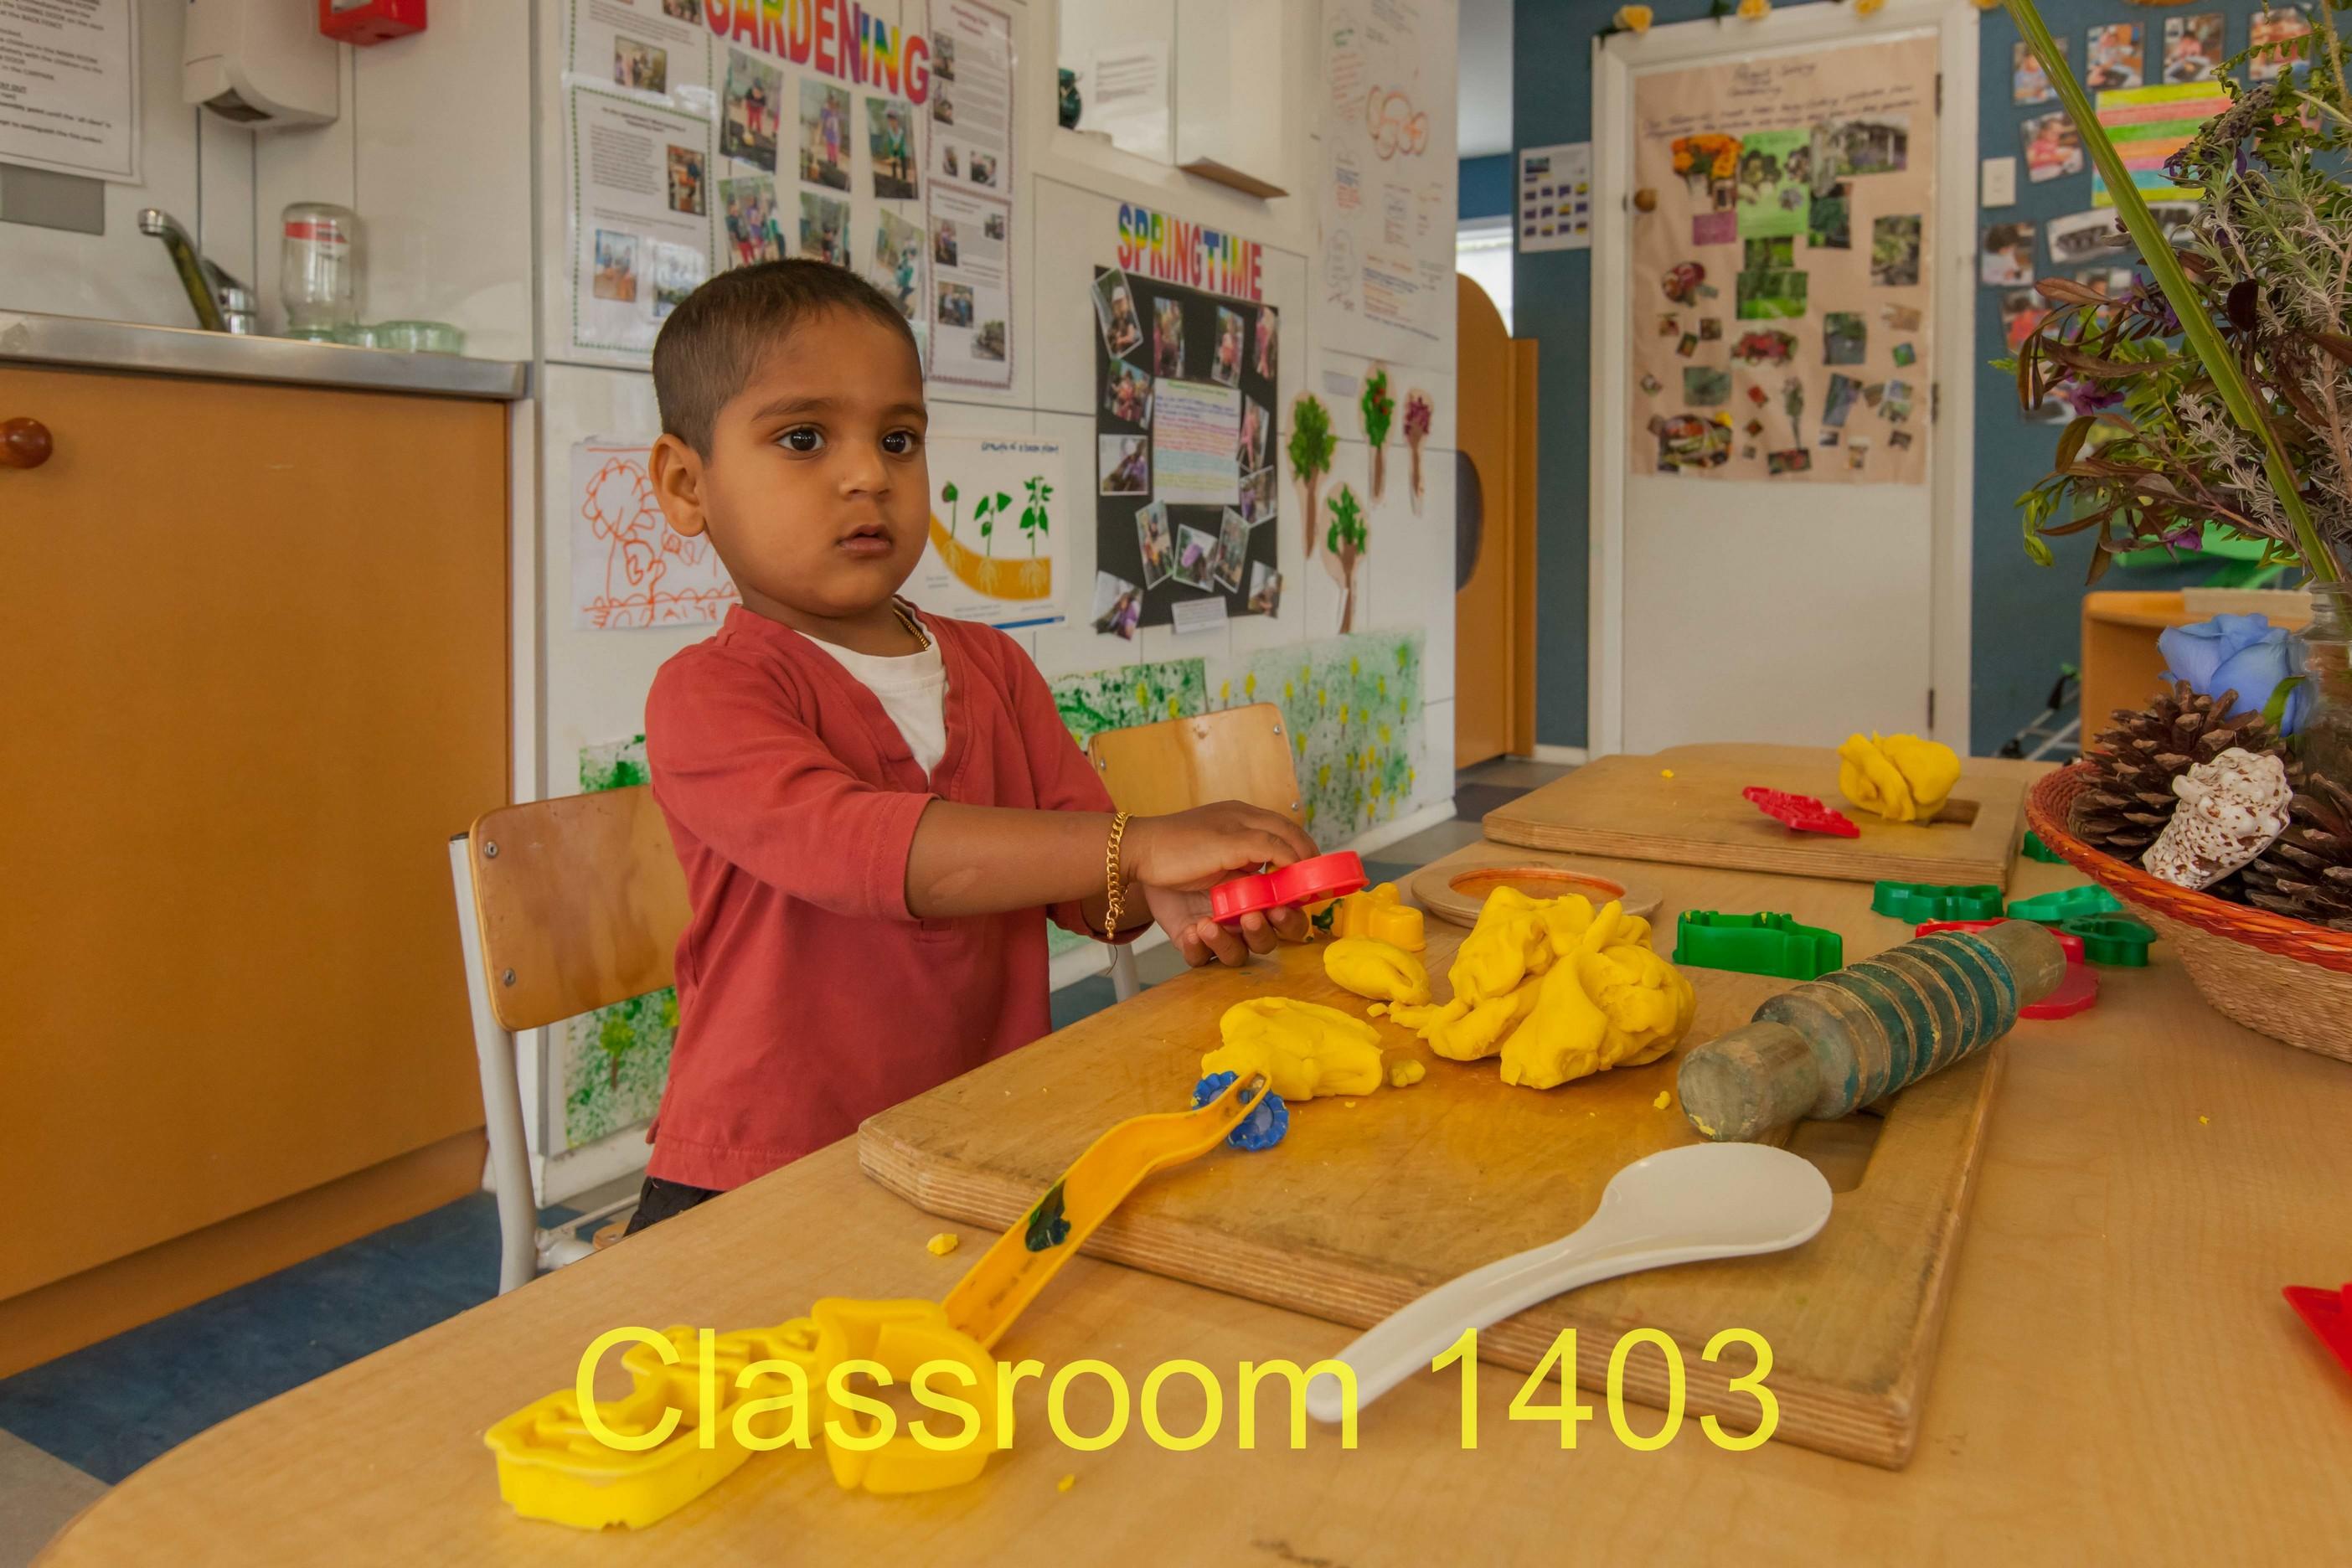 Classroom 1403